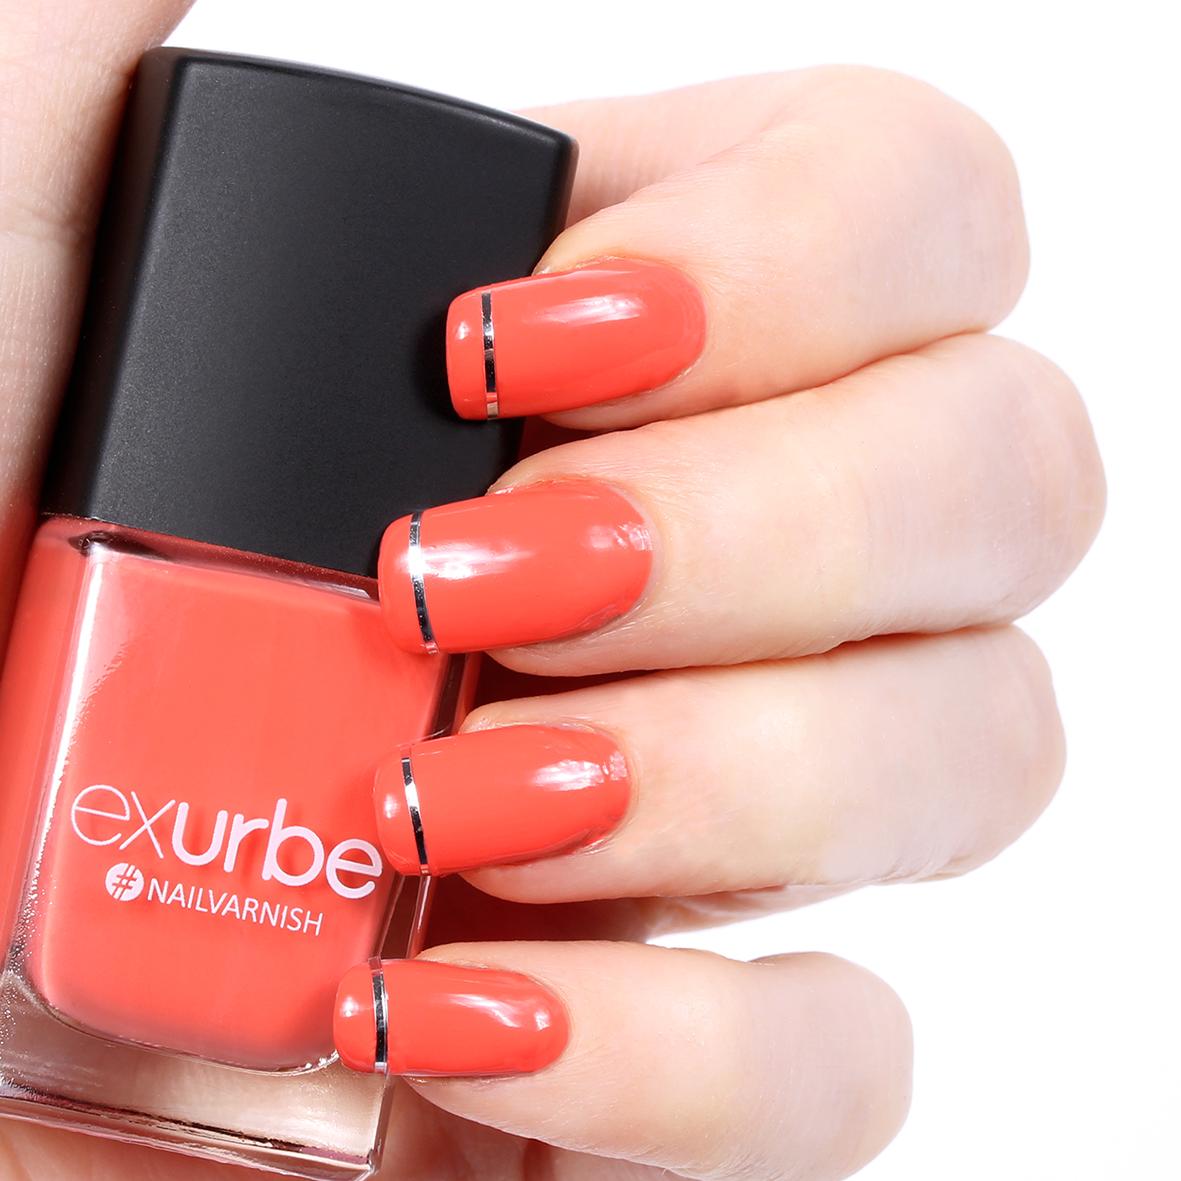 Tutti Frutti - Peach nail polish by exurbe cosmetics. With an easy ...